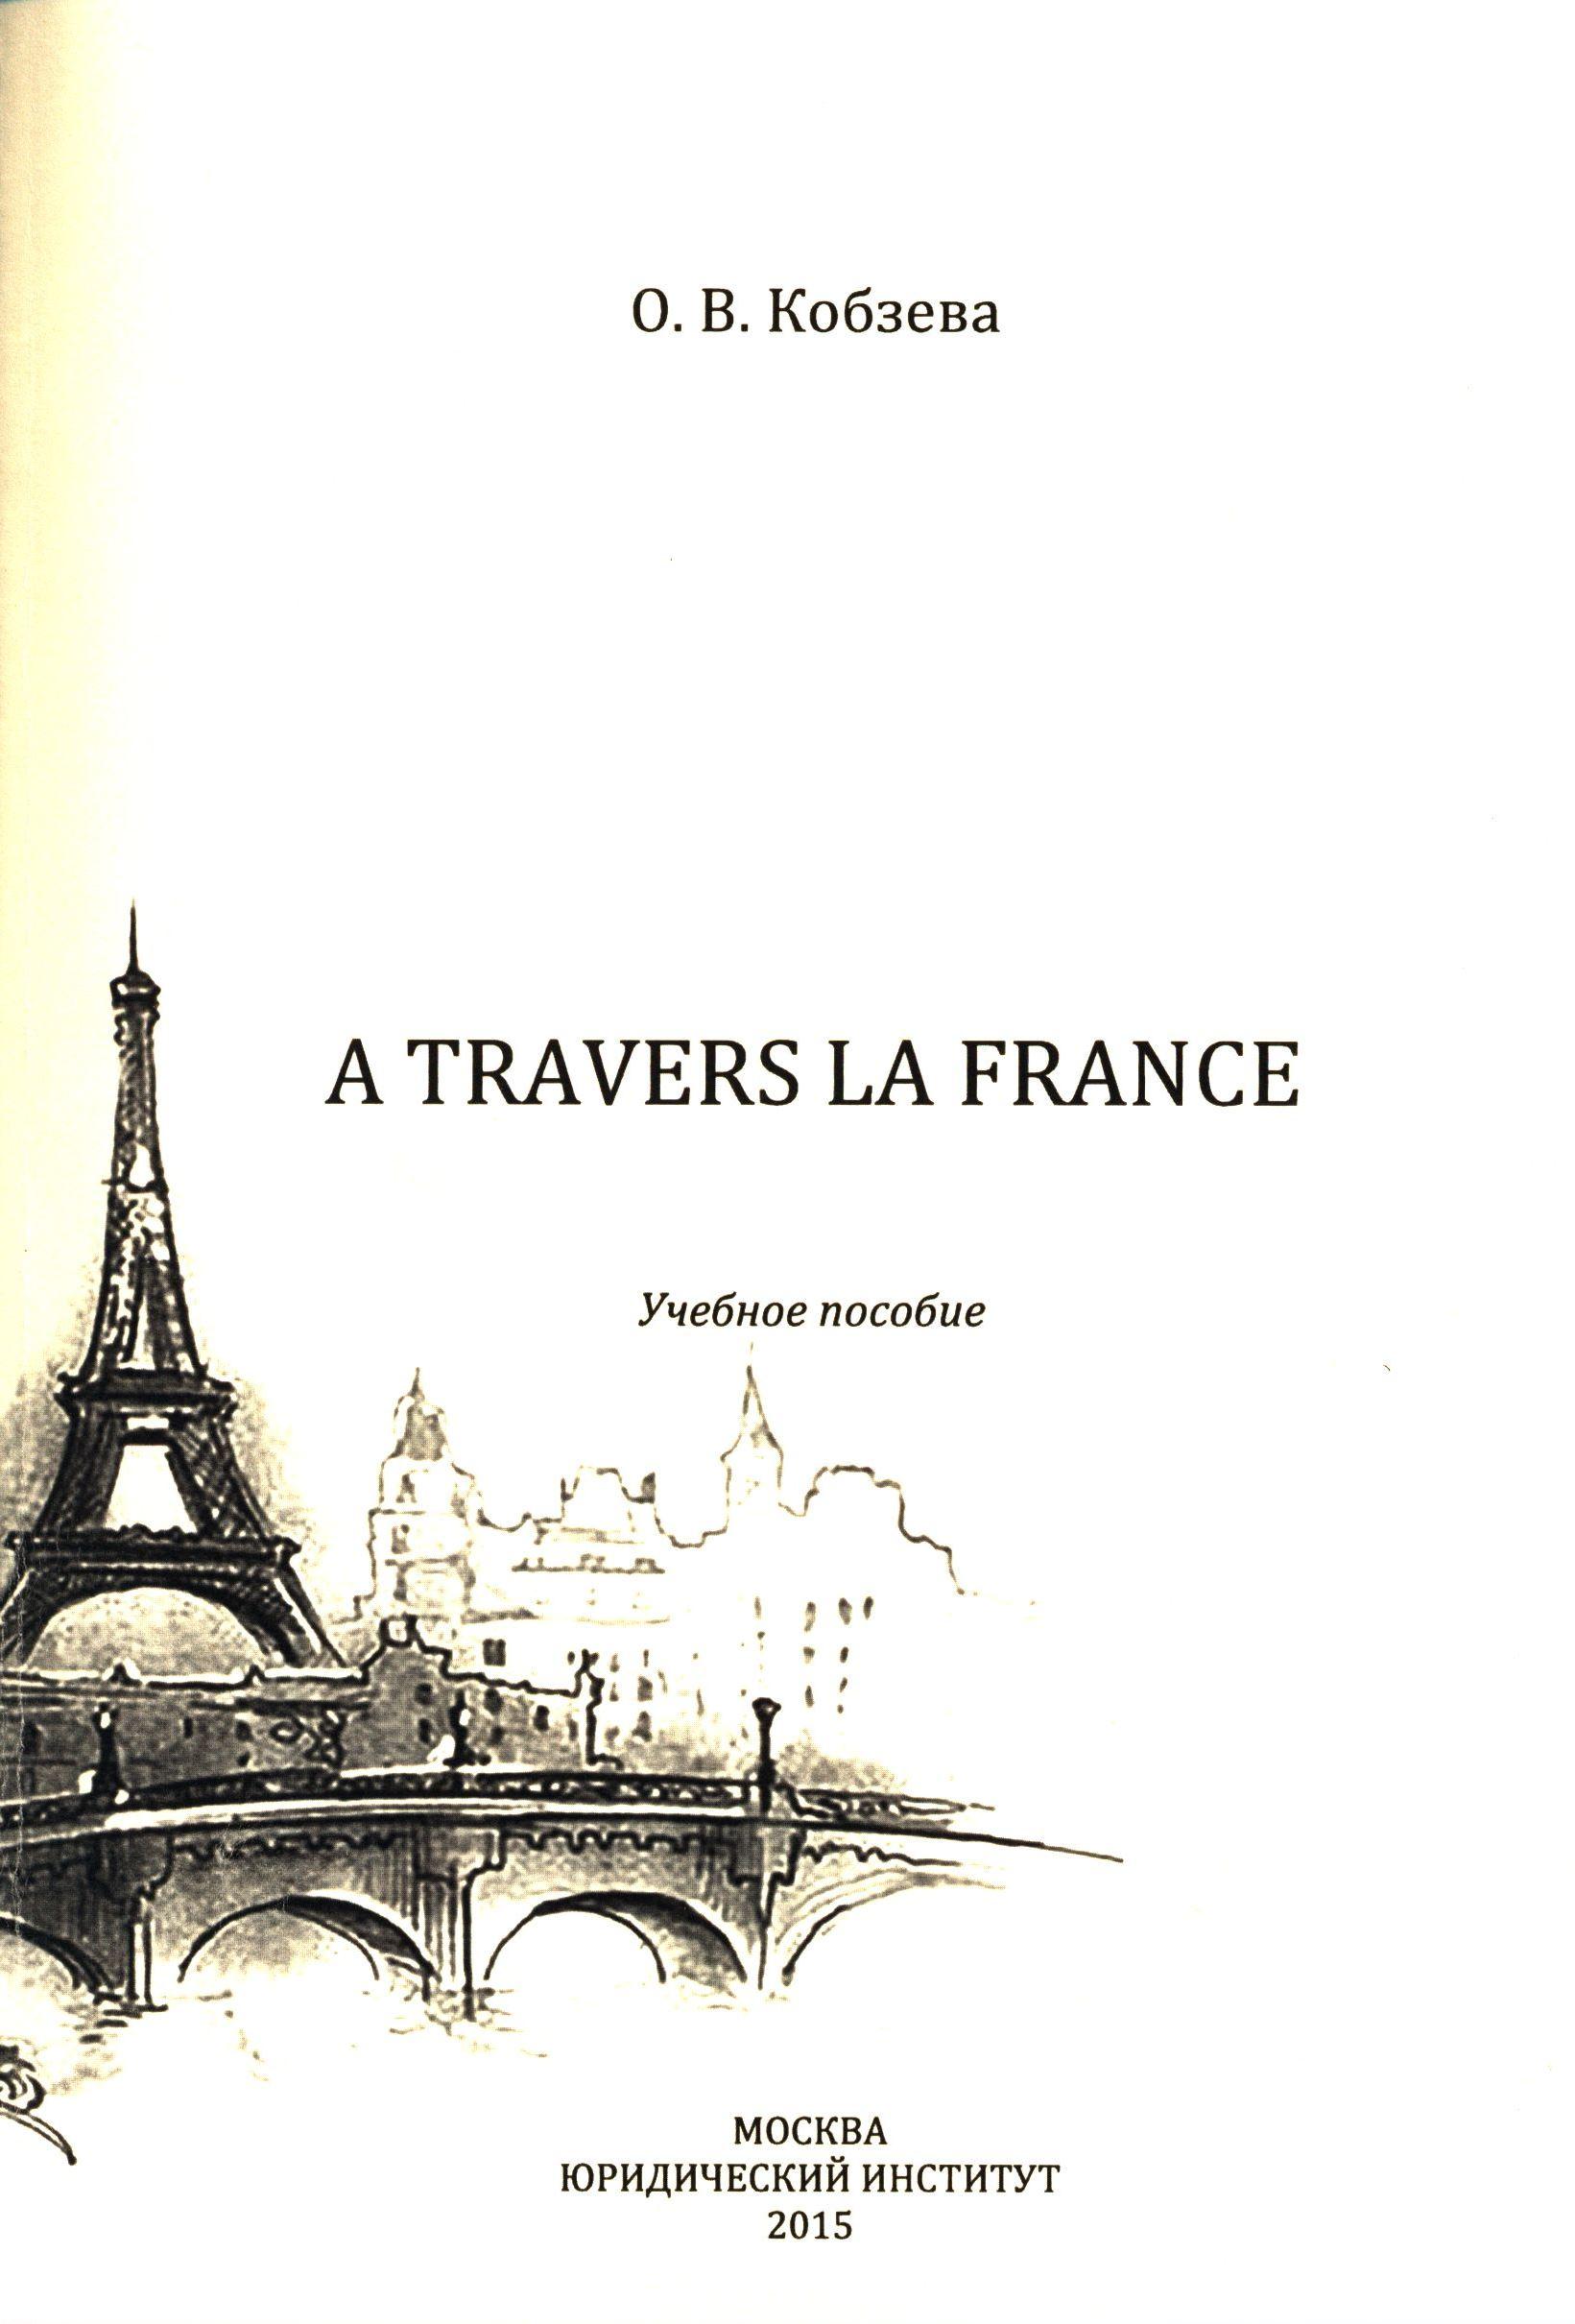 A travers la France